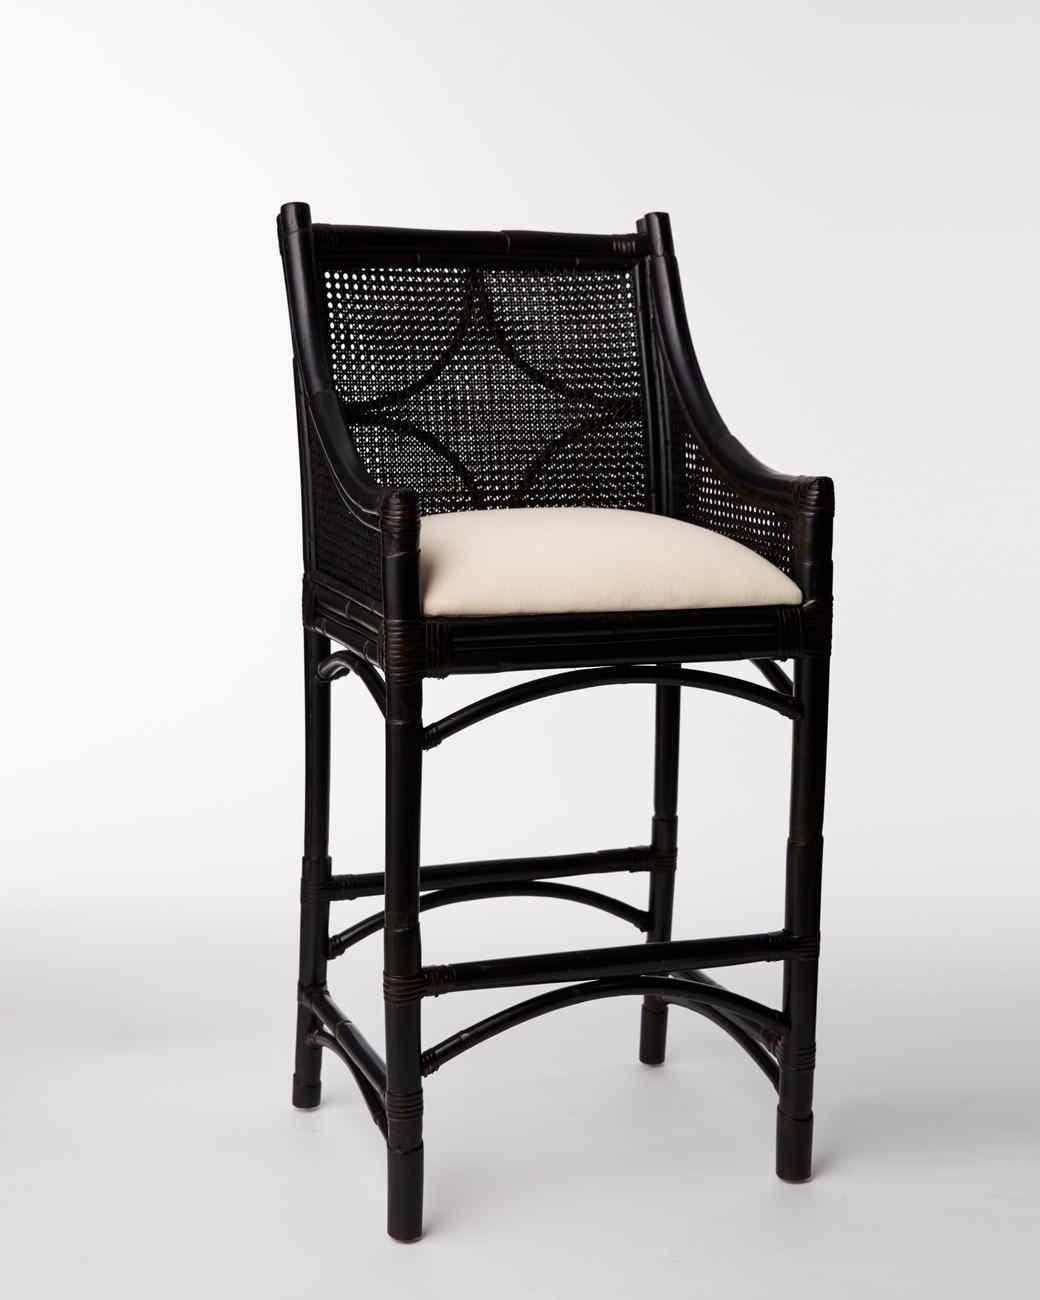 kitchen stool triple sink 顶级厨房凳子 功能玛莎斯图尔特 澳门金沙 休息一下你的手臂